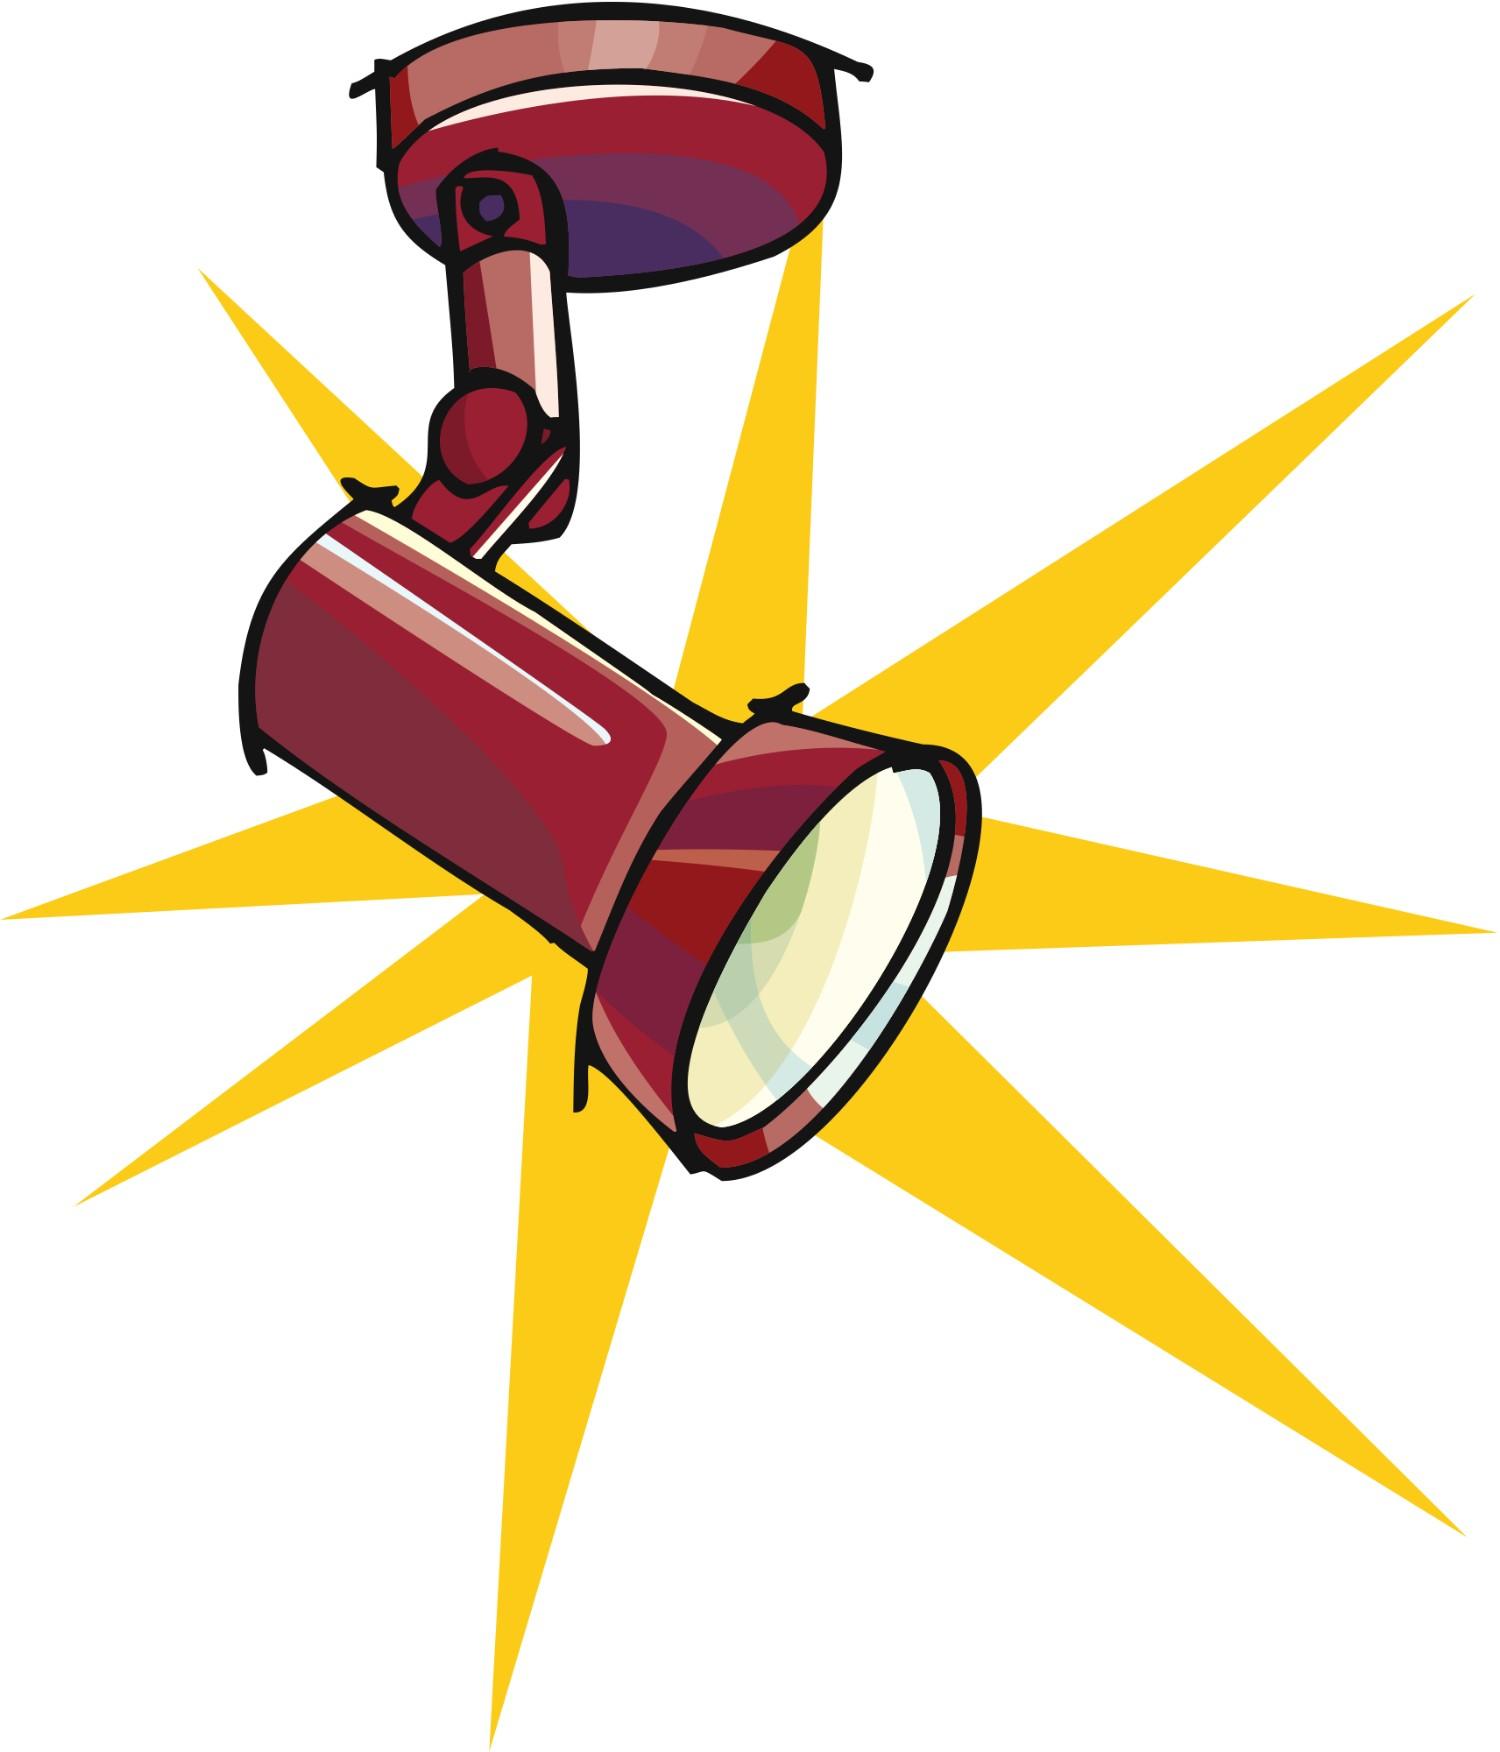 Cartoon spotlight clipart graphic library download Free Spotlight Cliparts, Download Free Clip Art, Free Clip Art on ... graphic library download